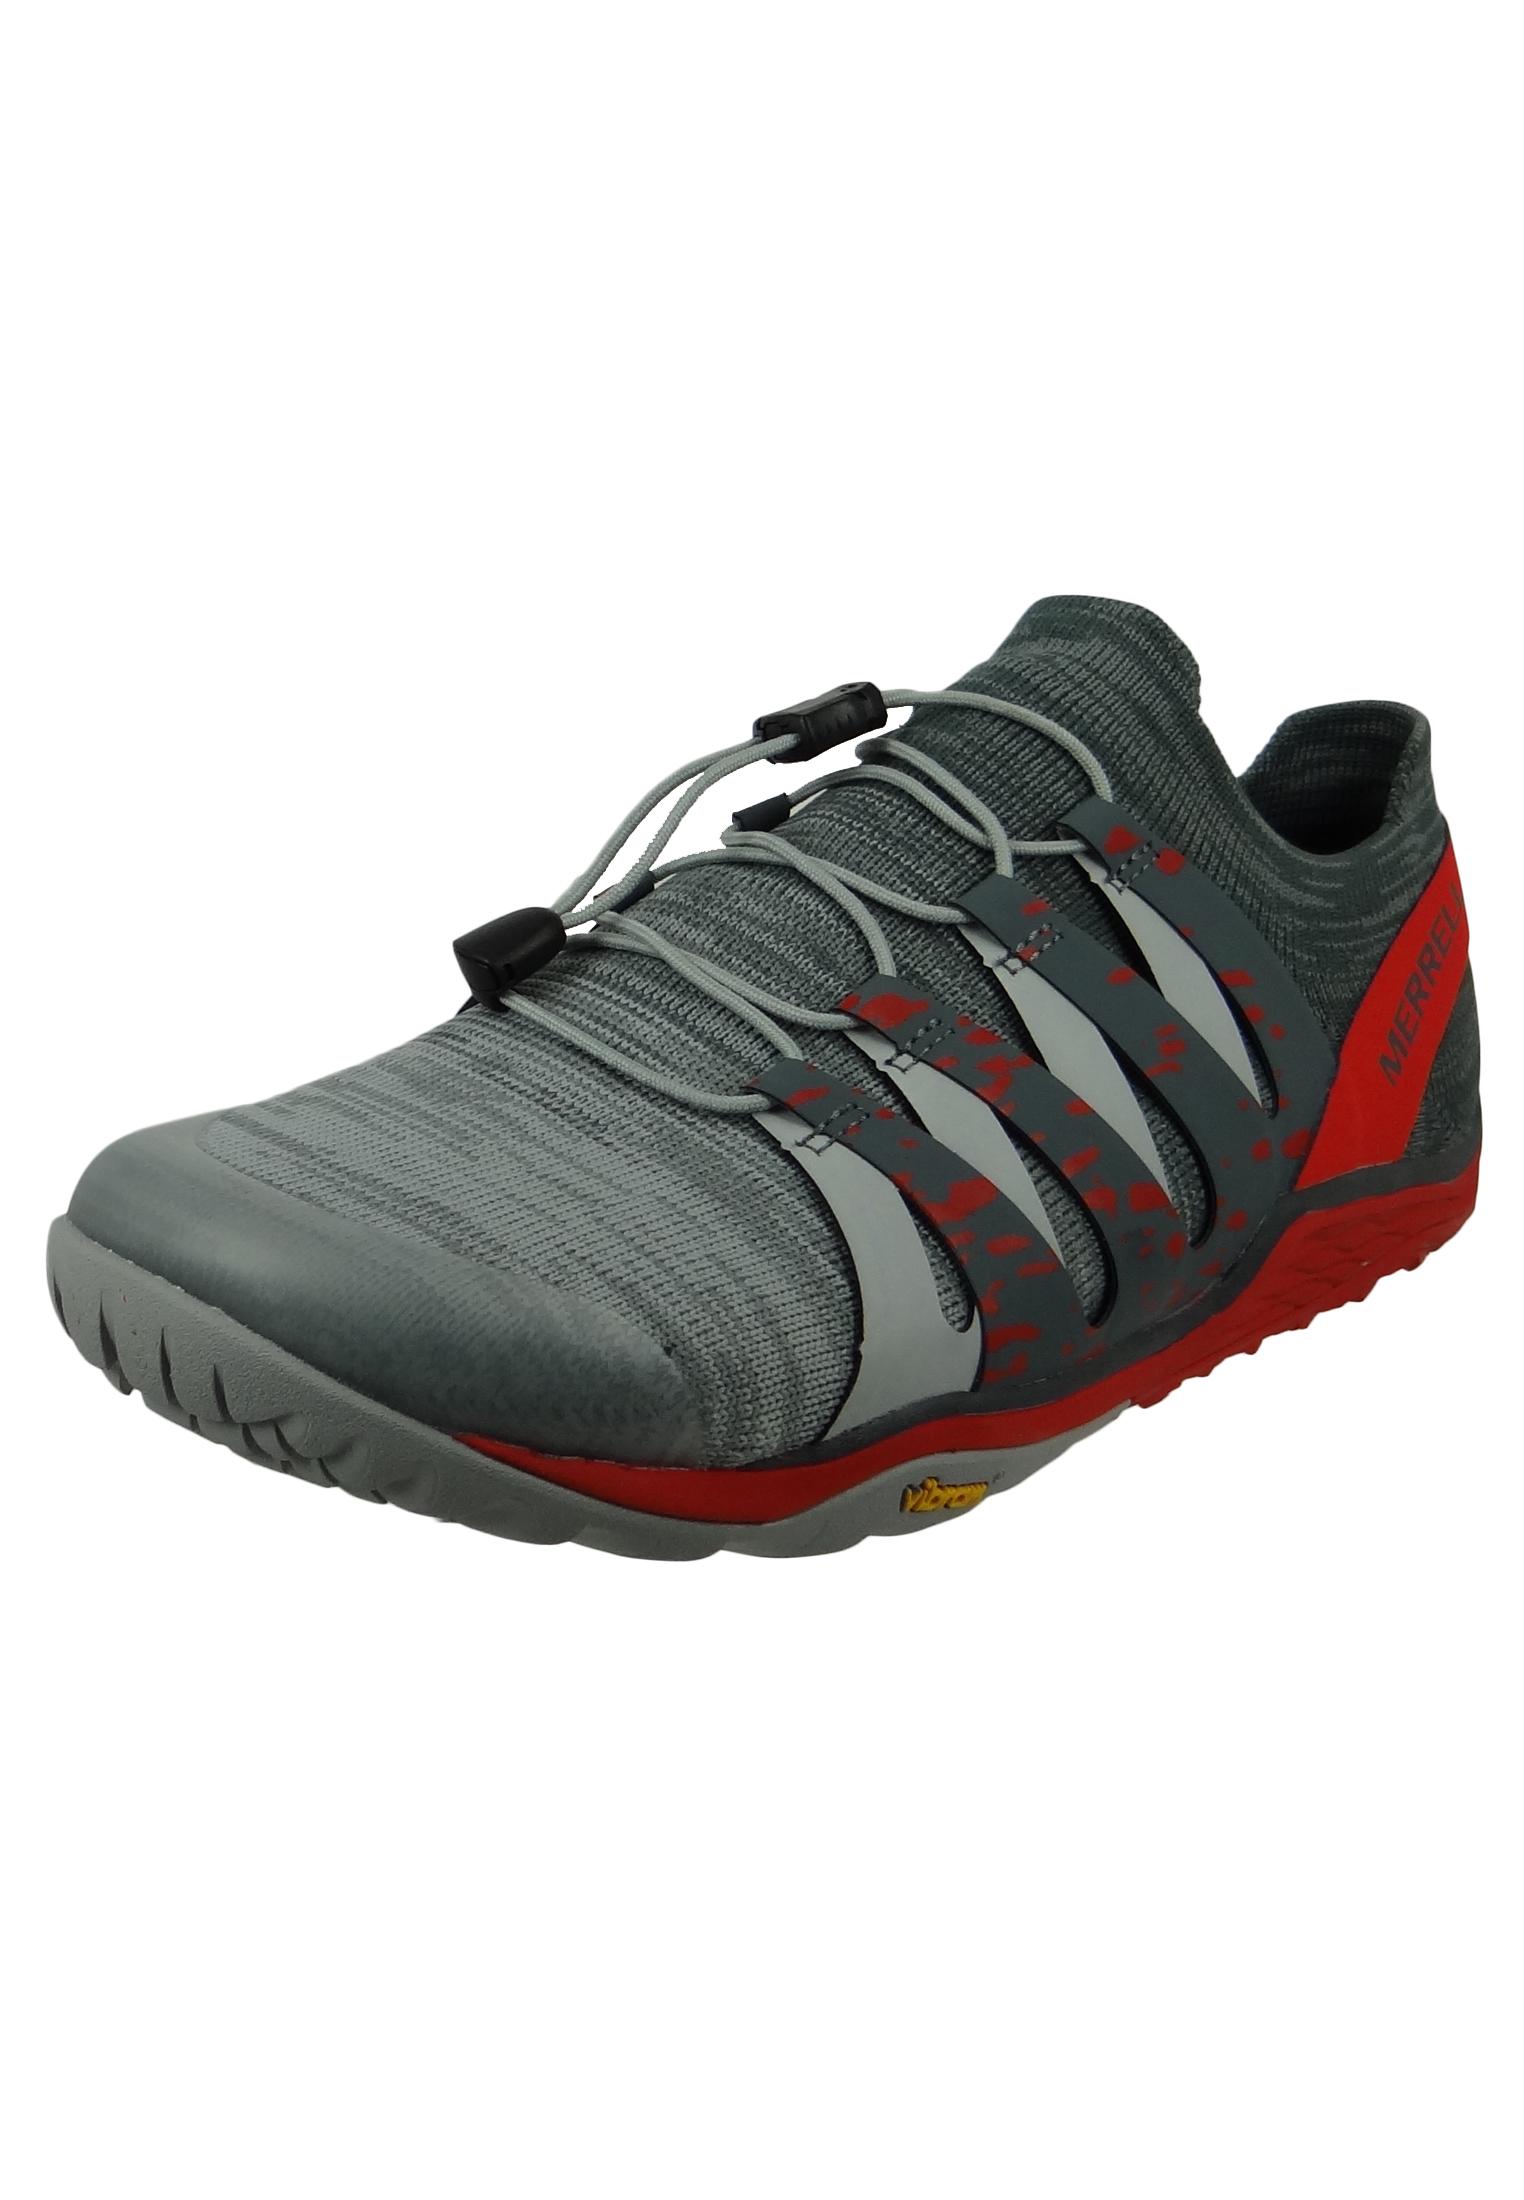 Merrell Trail Glove 5 3D J48883 Herren High Rise Grau Trail Running Barefoot Run